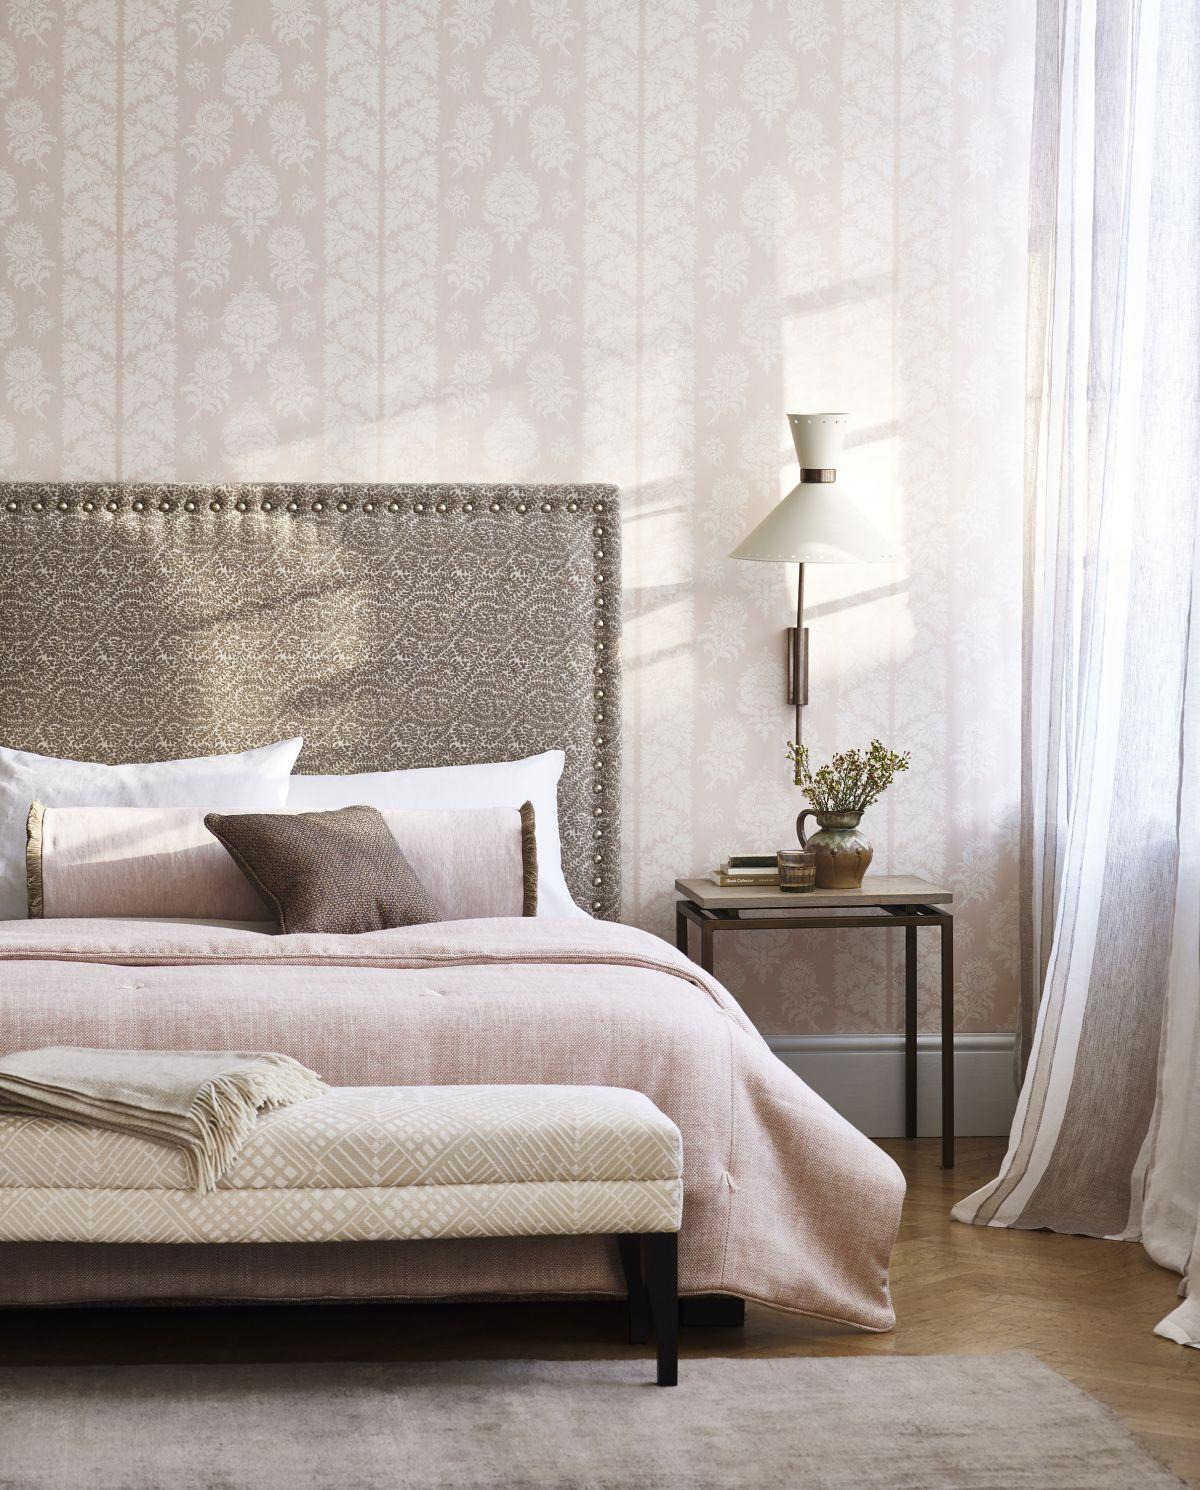 Bedroom Curtain Ideas 16 Curtain Designs For Beautiful